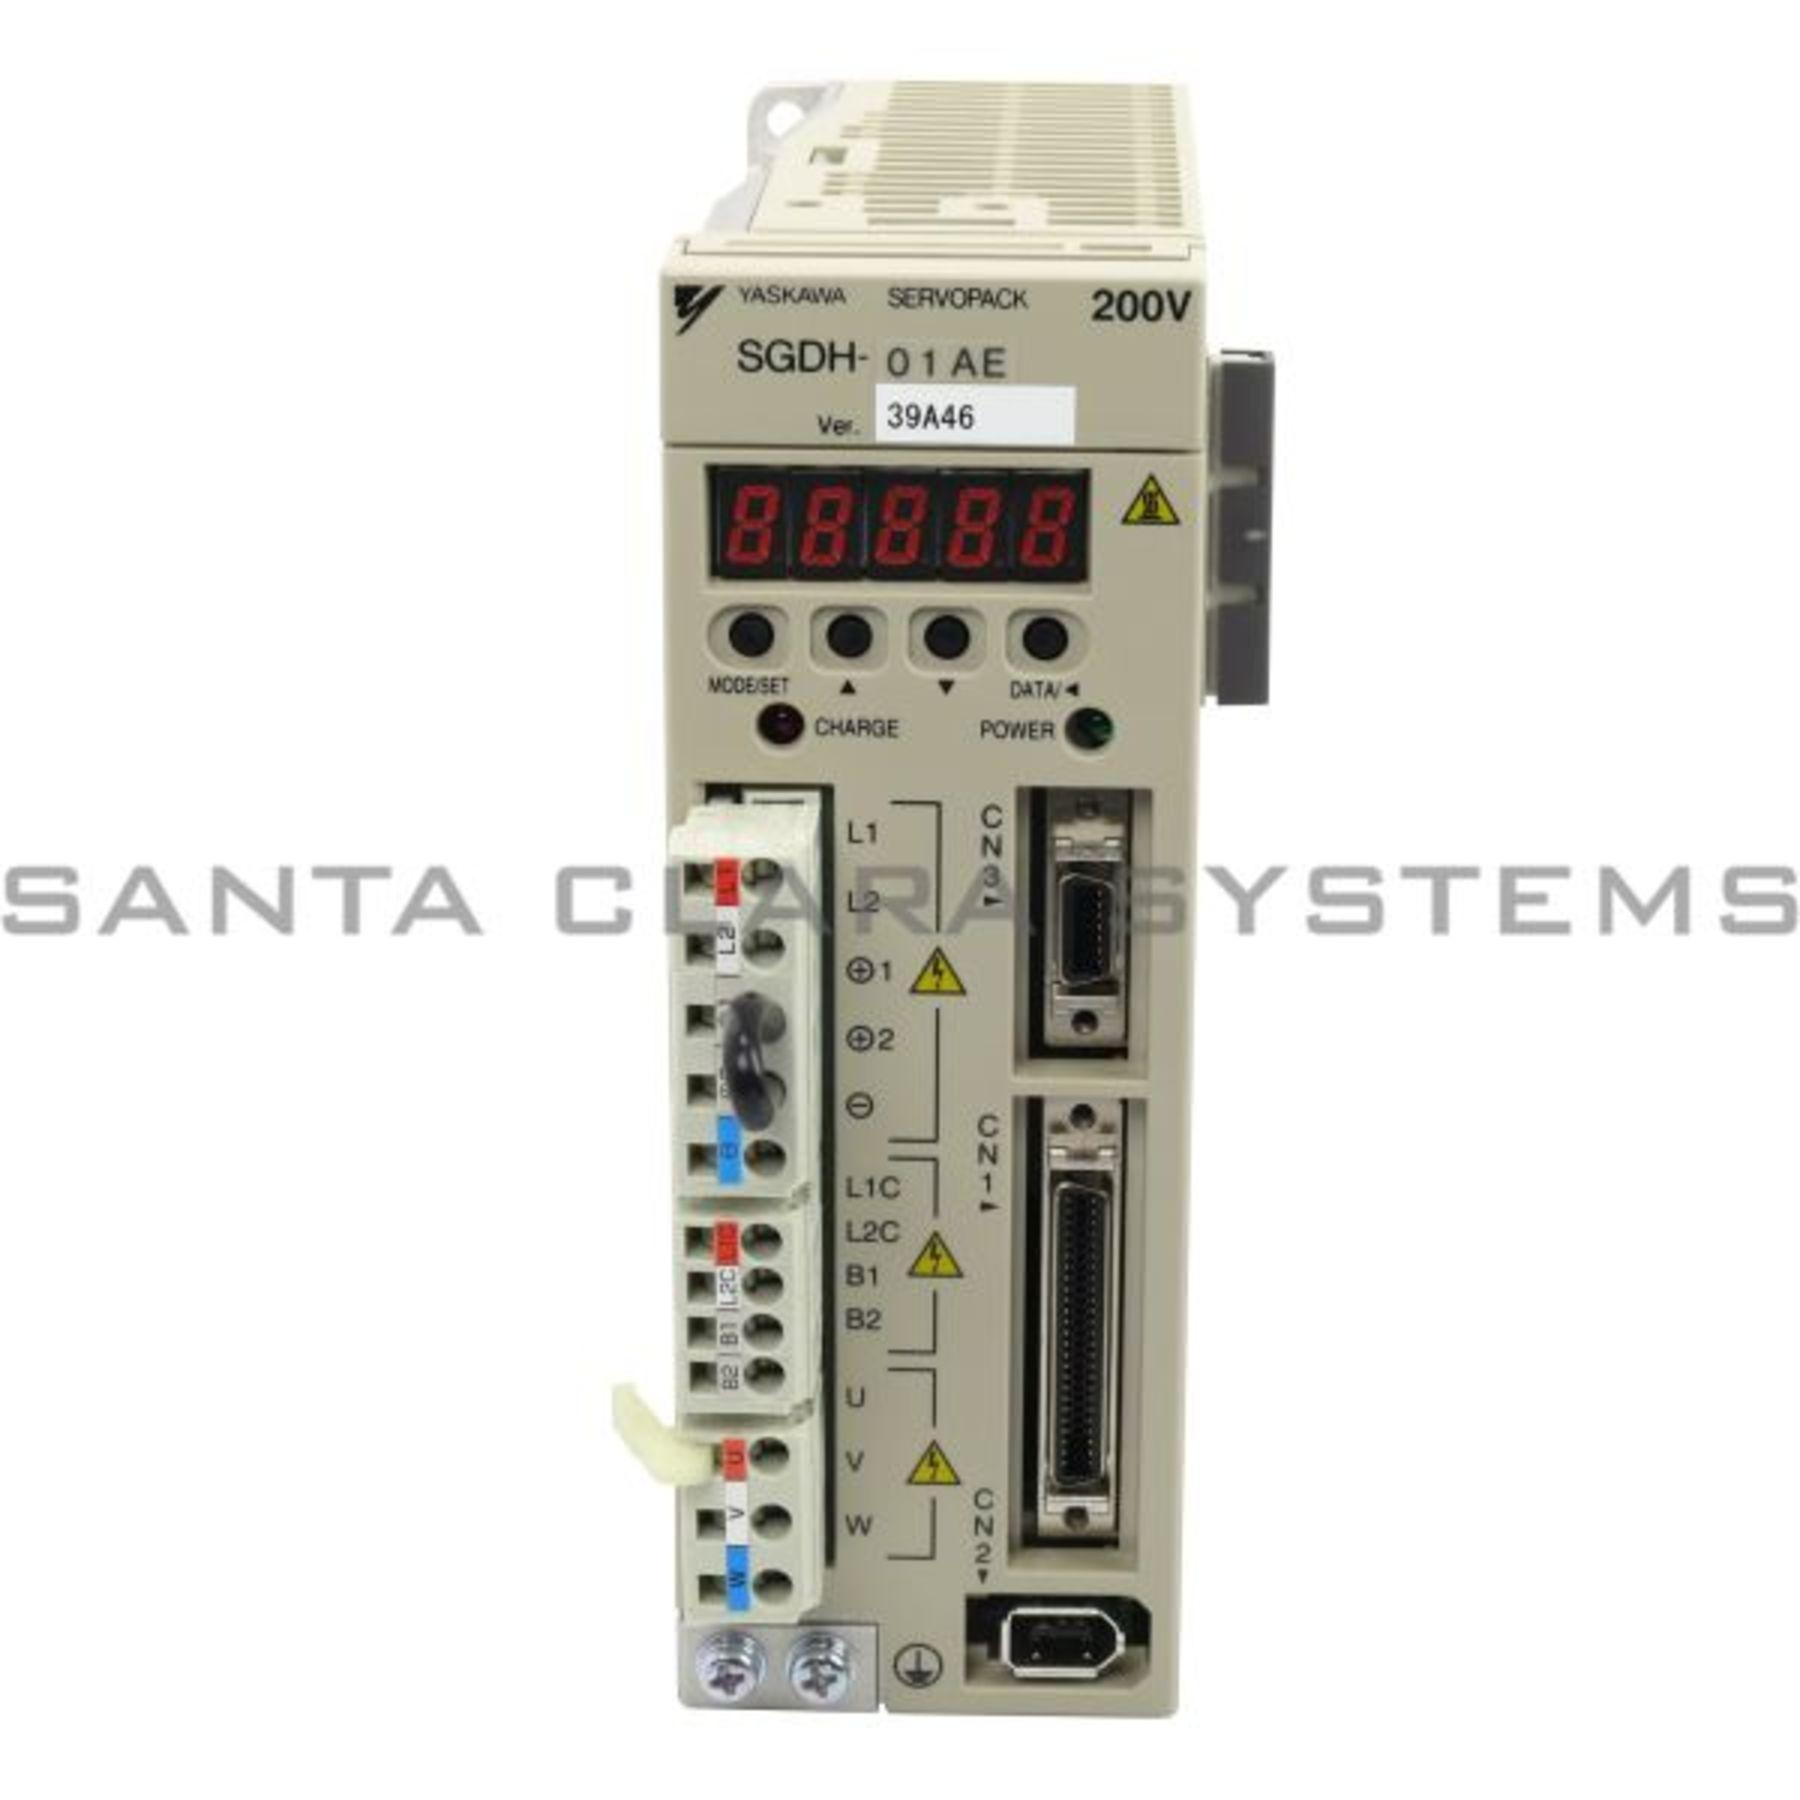 SGDH-01AE Yaskawa In stock and ready to ship - Santa Clara